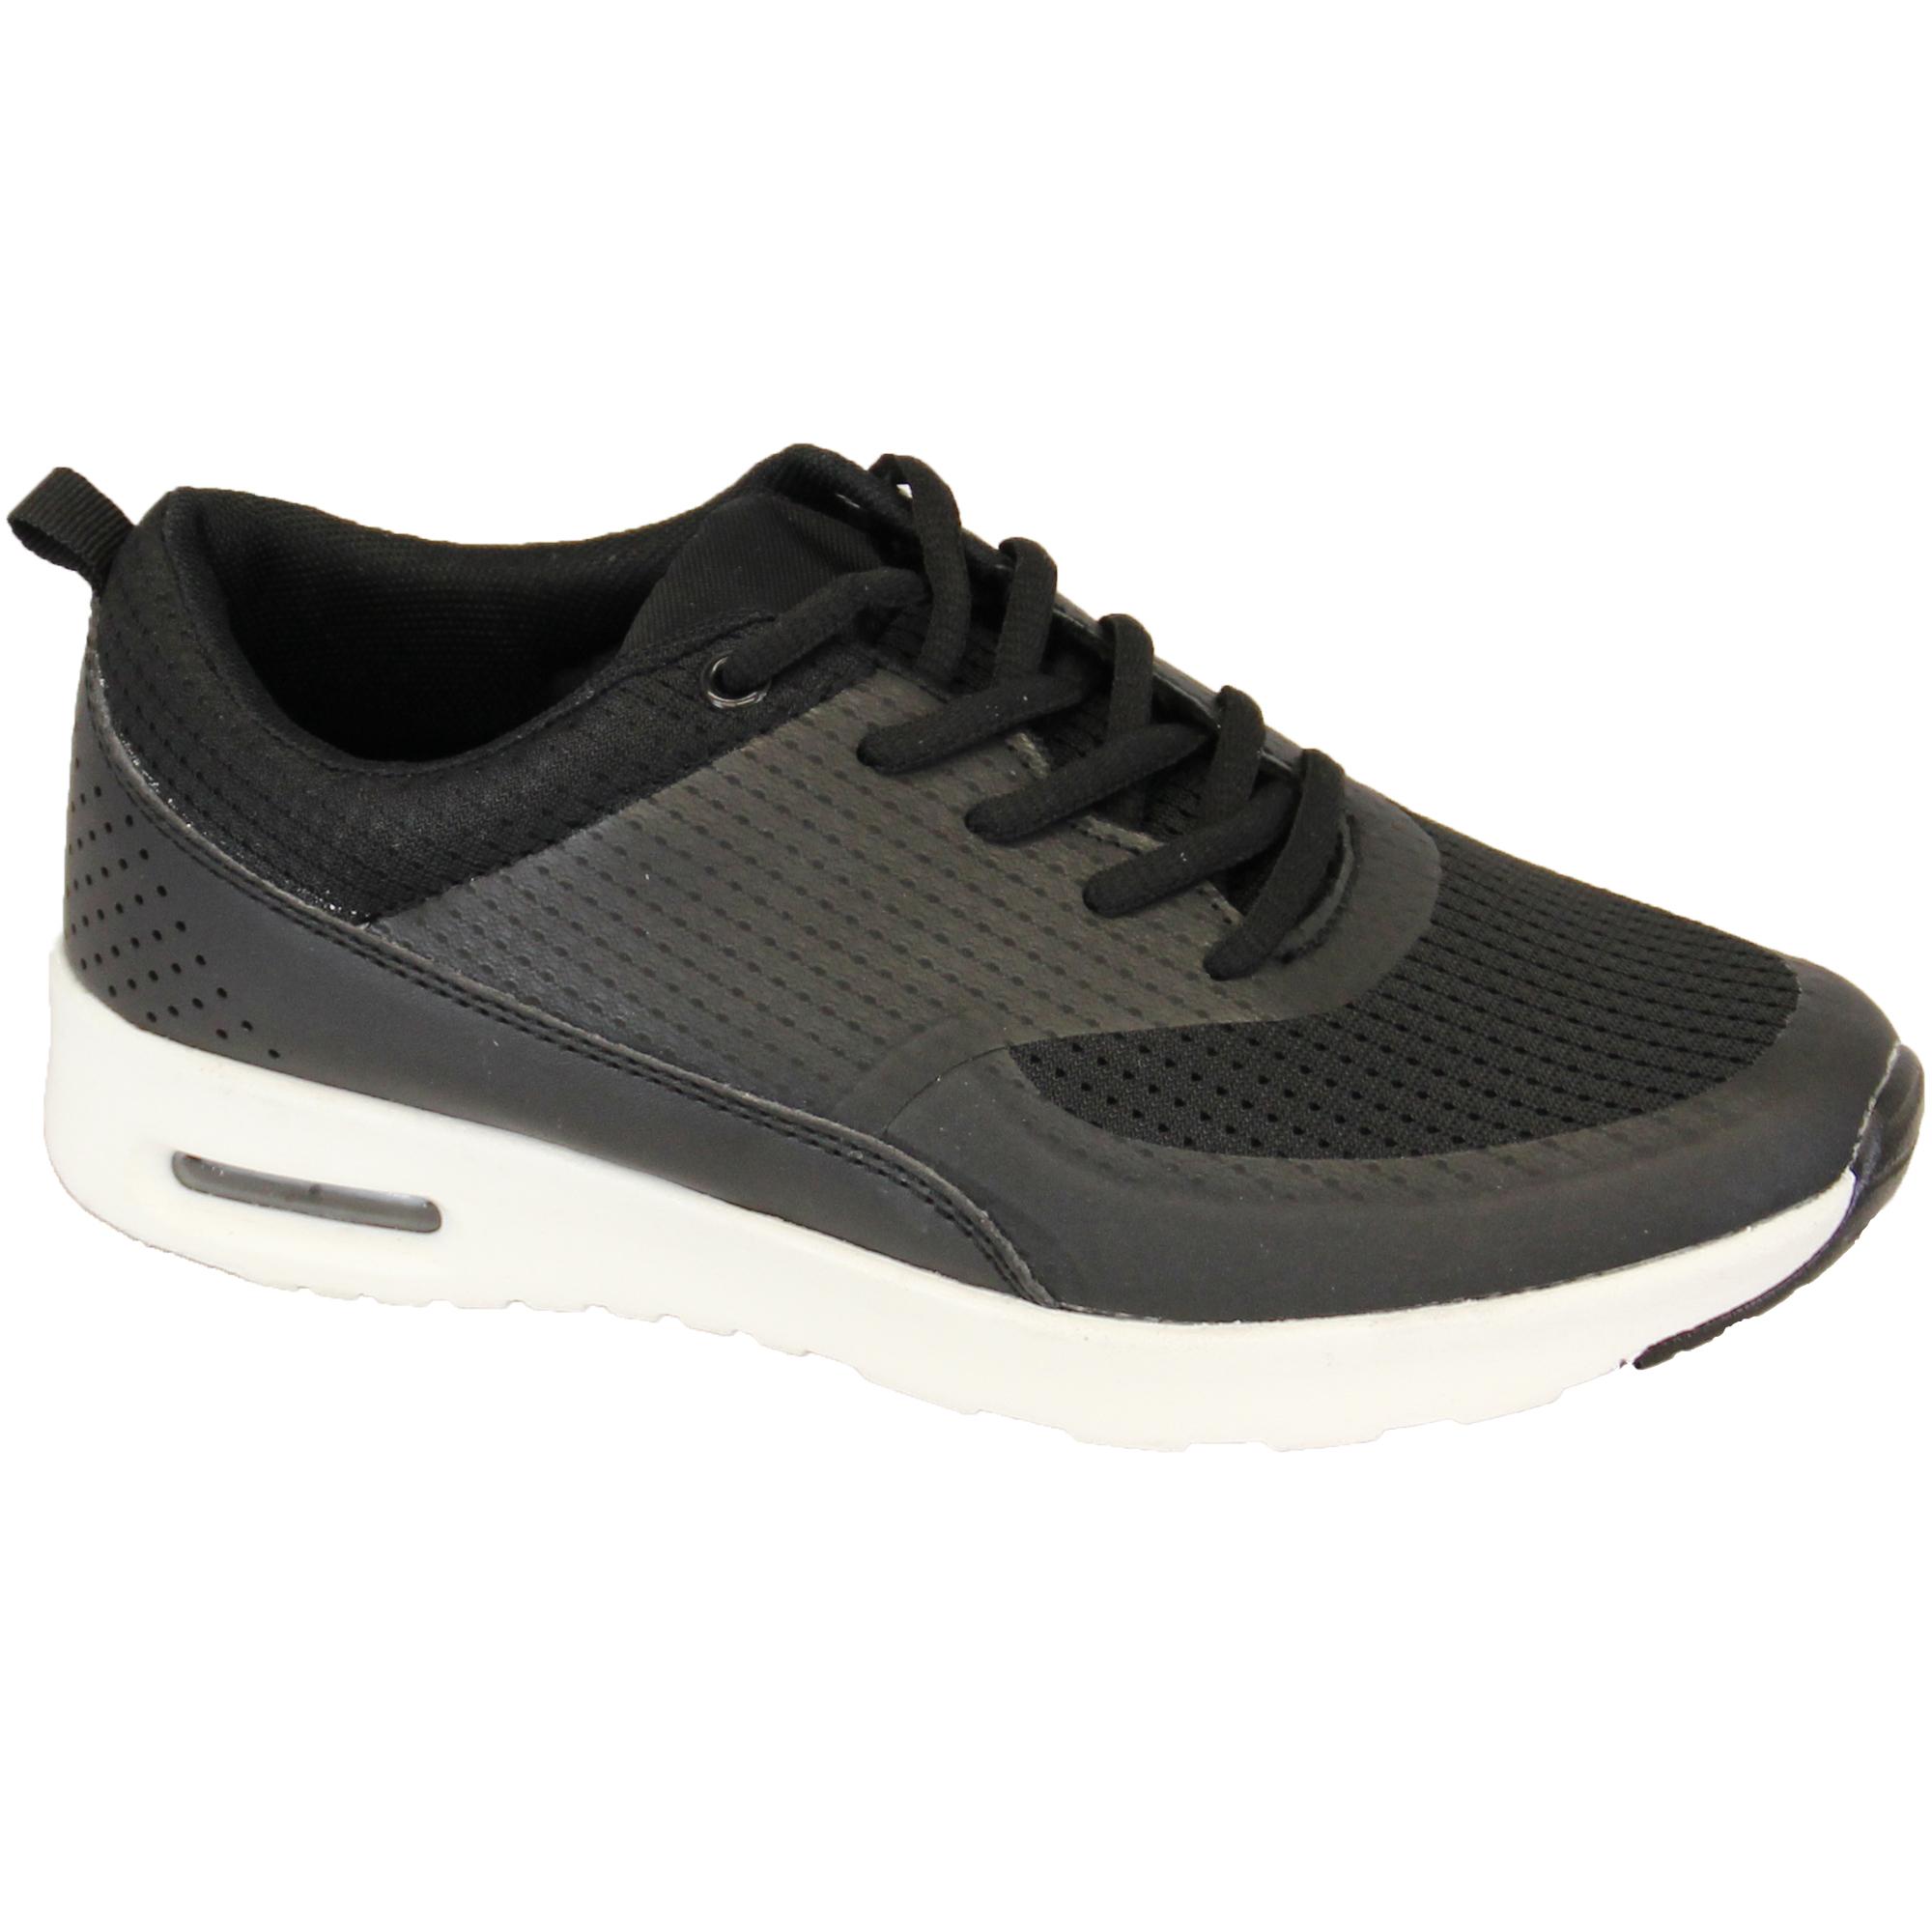 Spalding Ladies Shoes